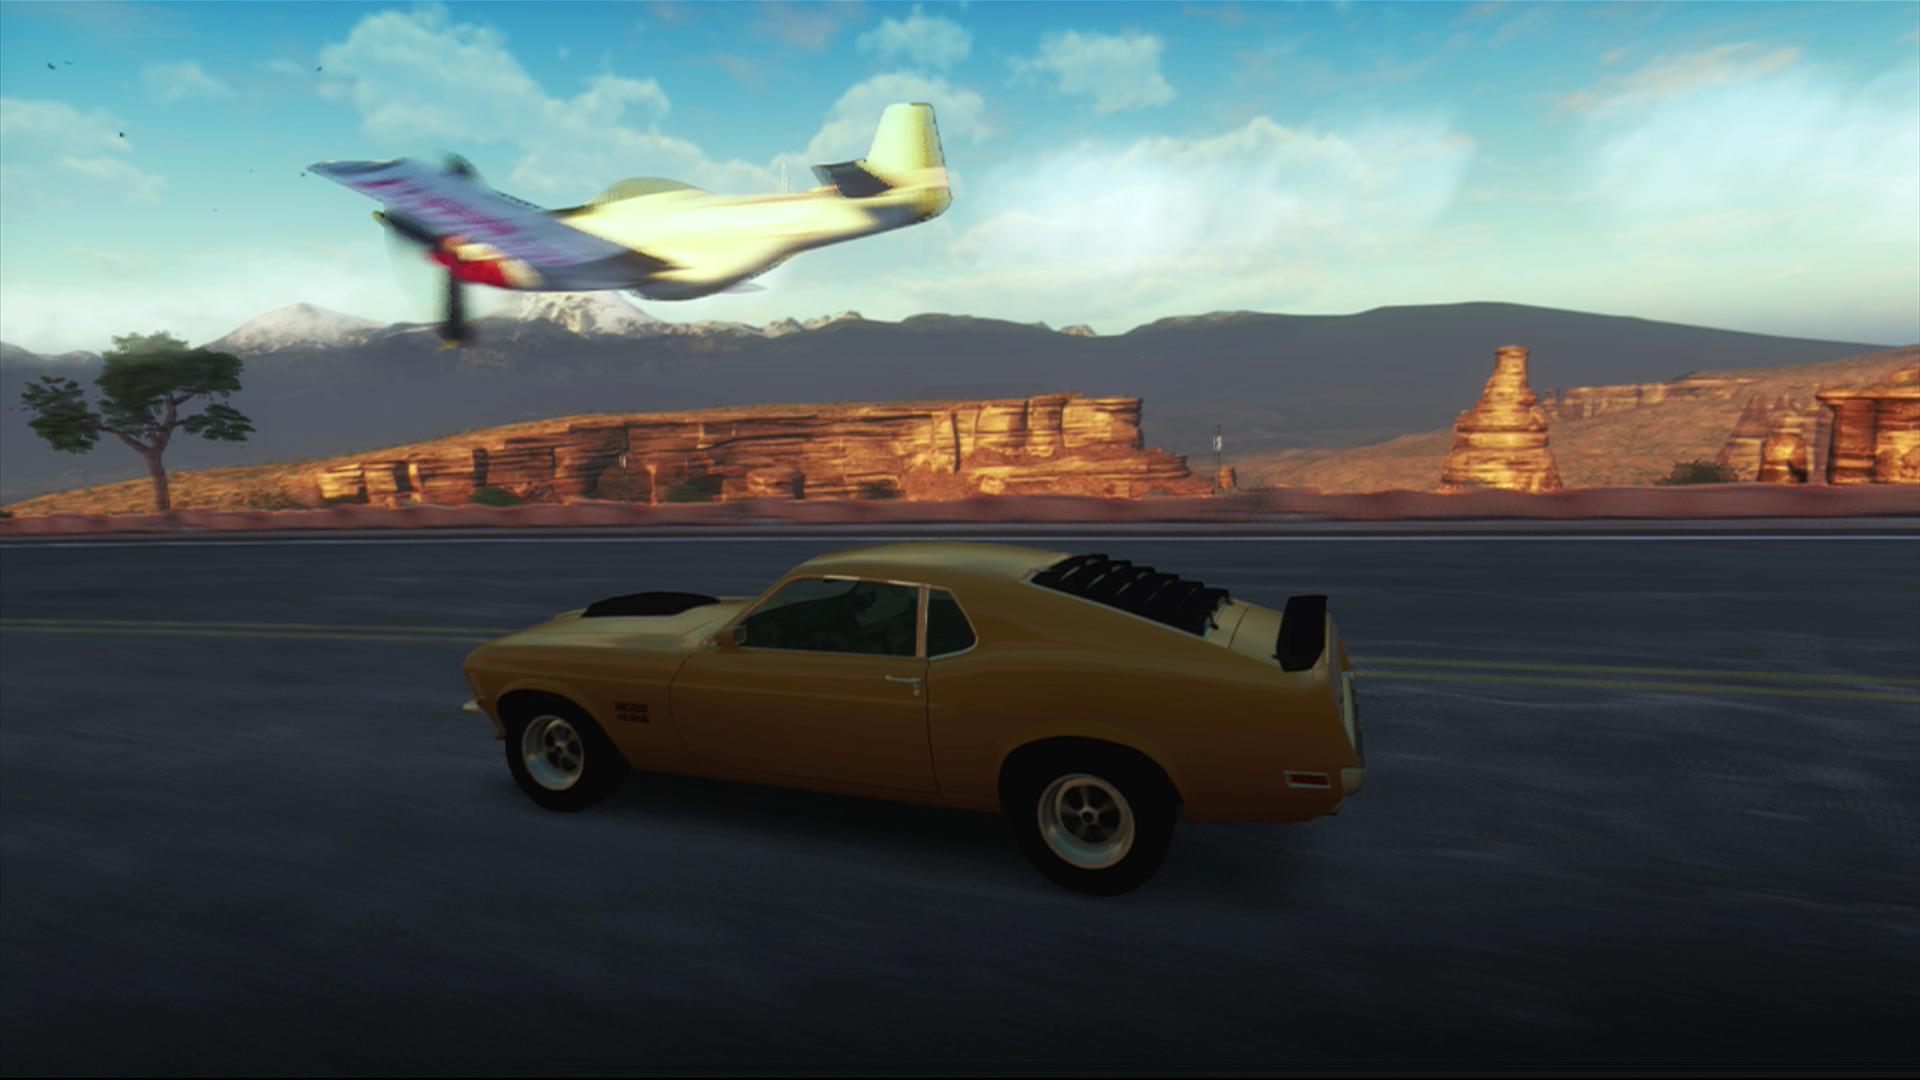 Forza Horizon - plane race2 - 2013-02-10 10-34-07